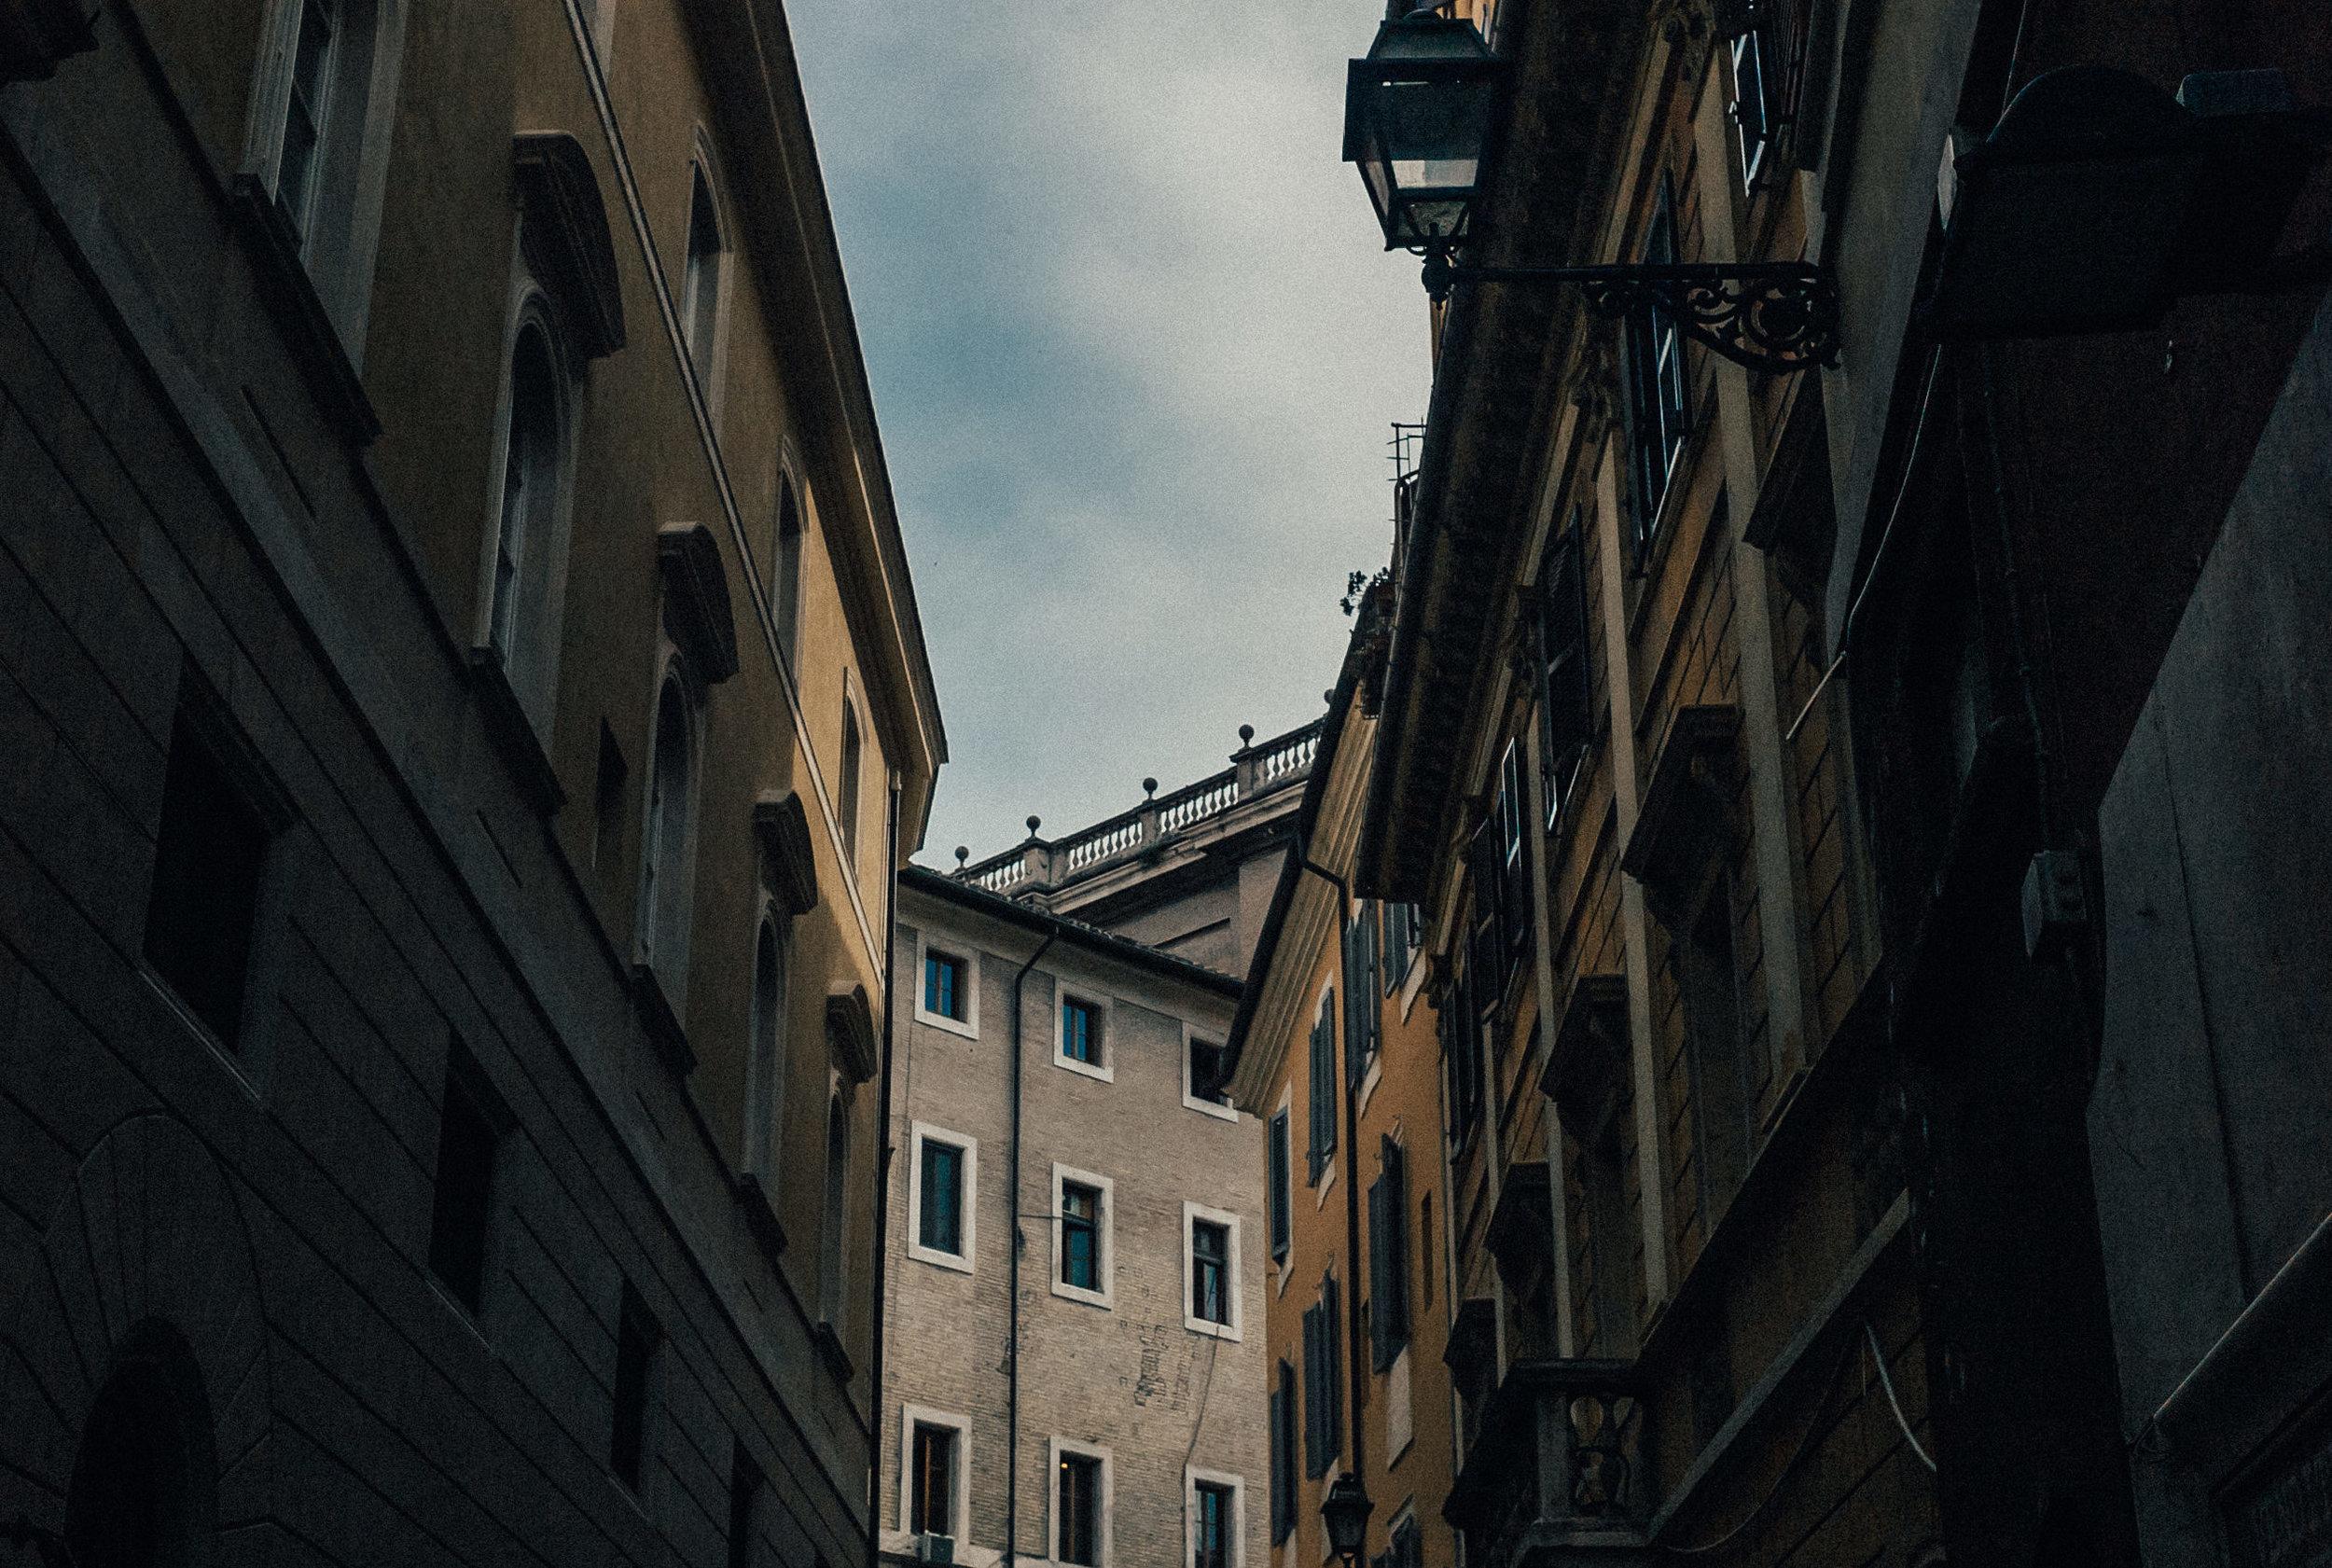 italy_travel_photography30.jpg